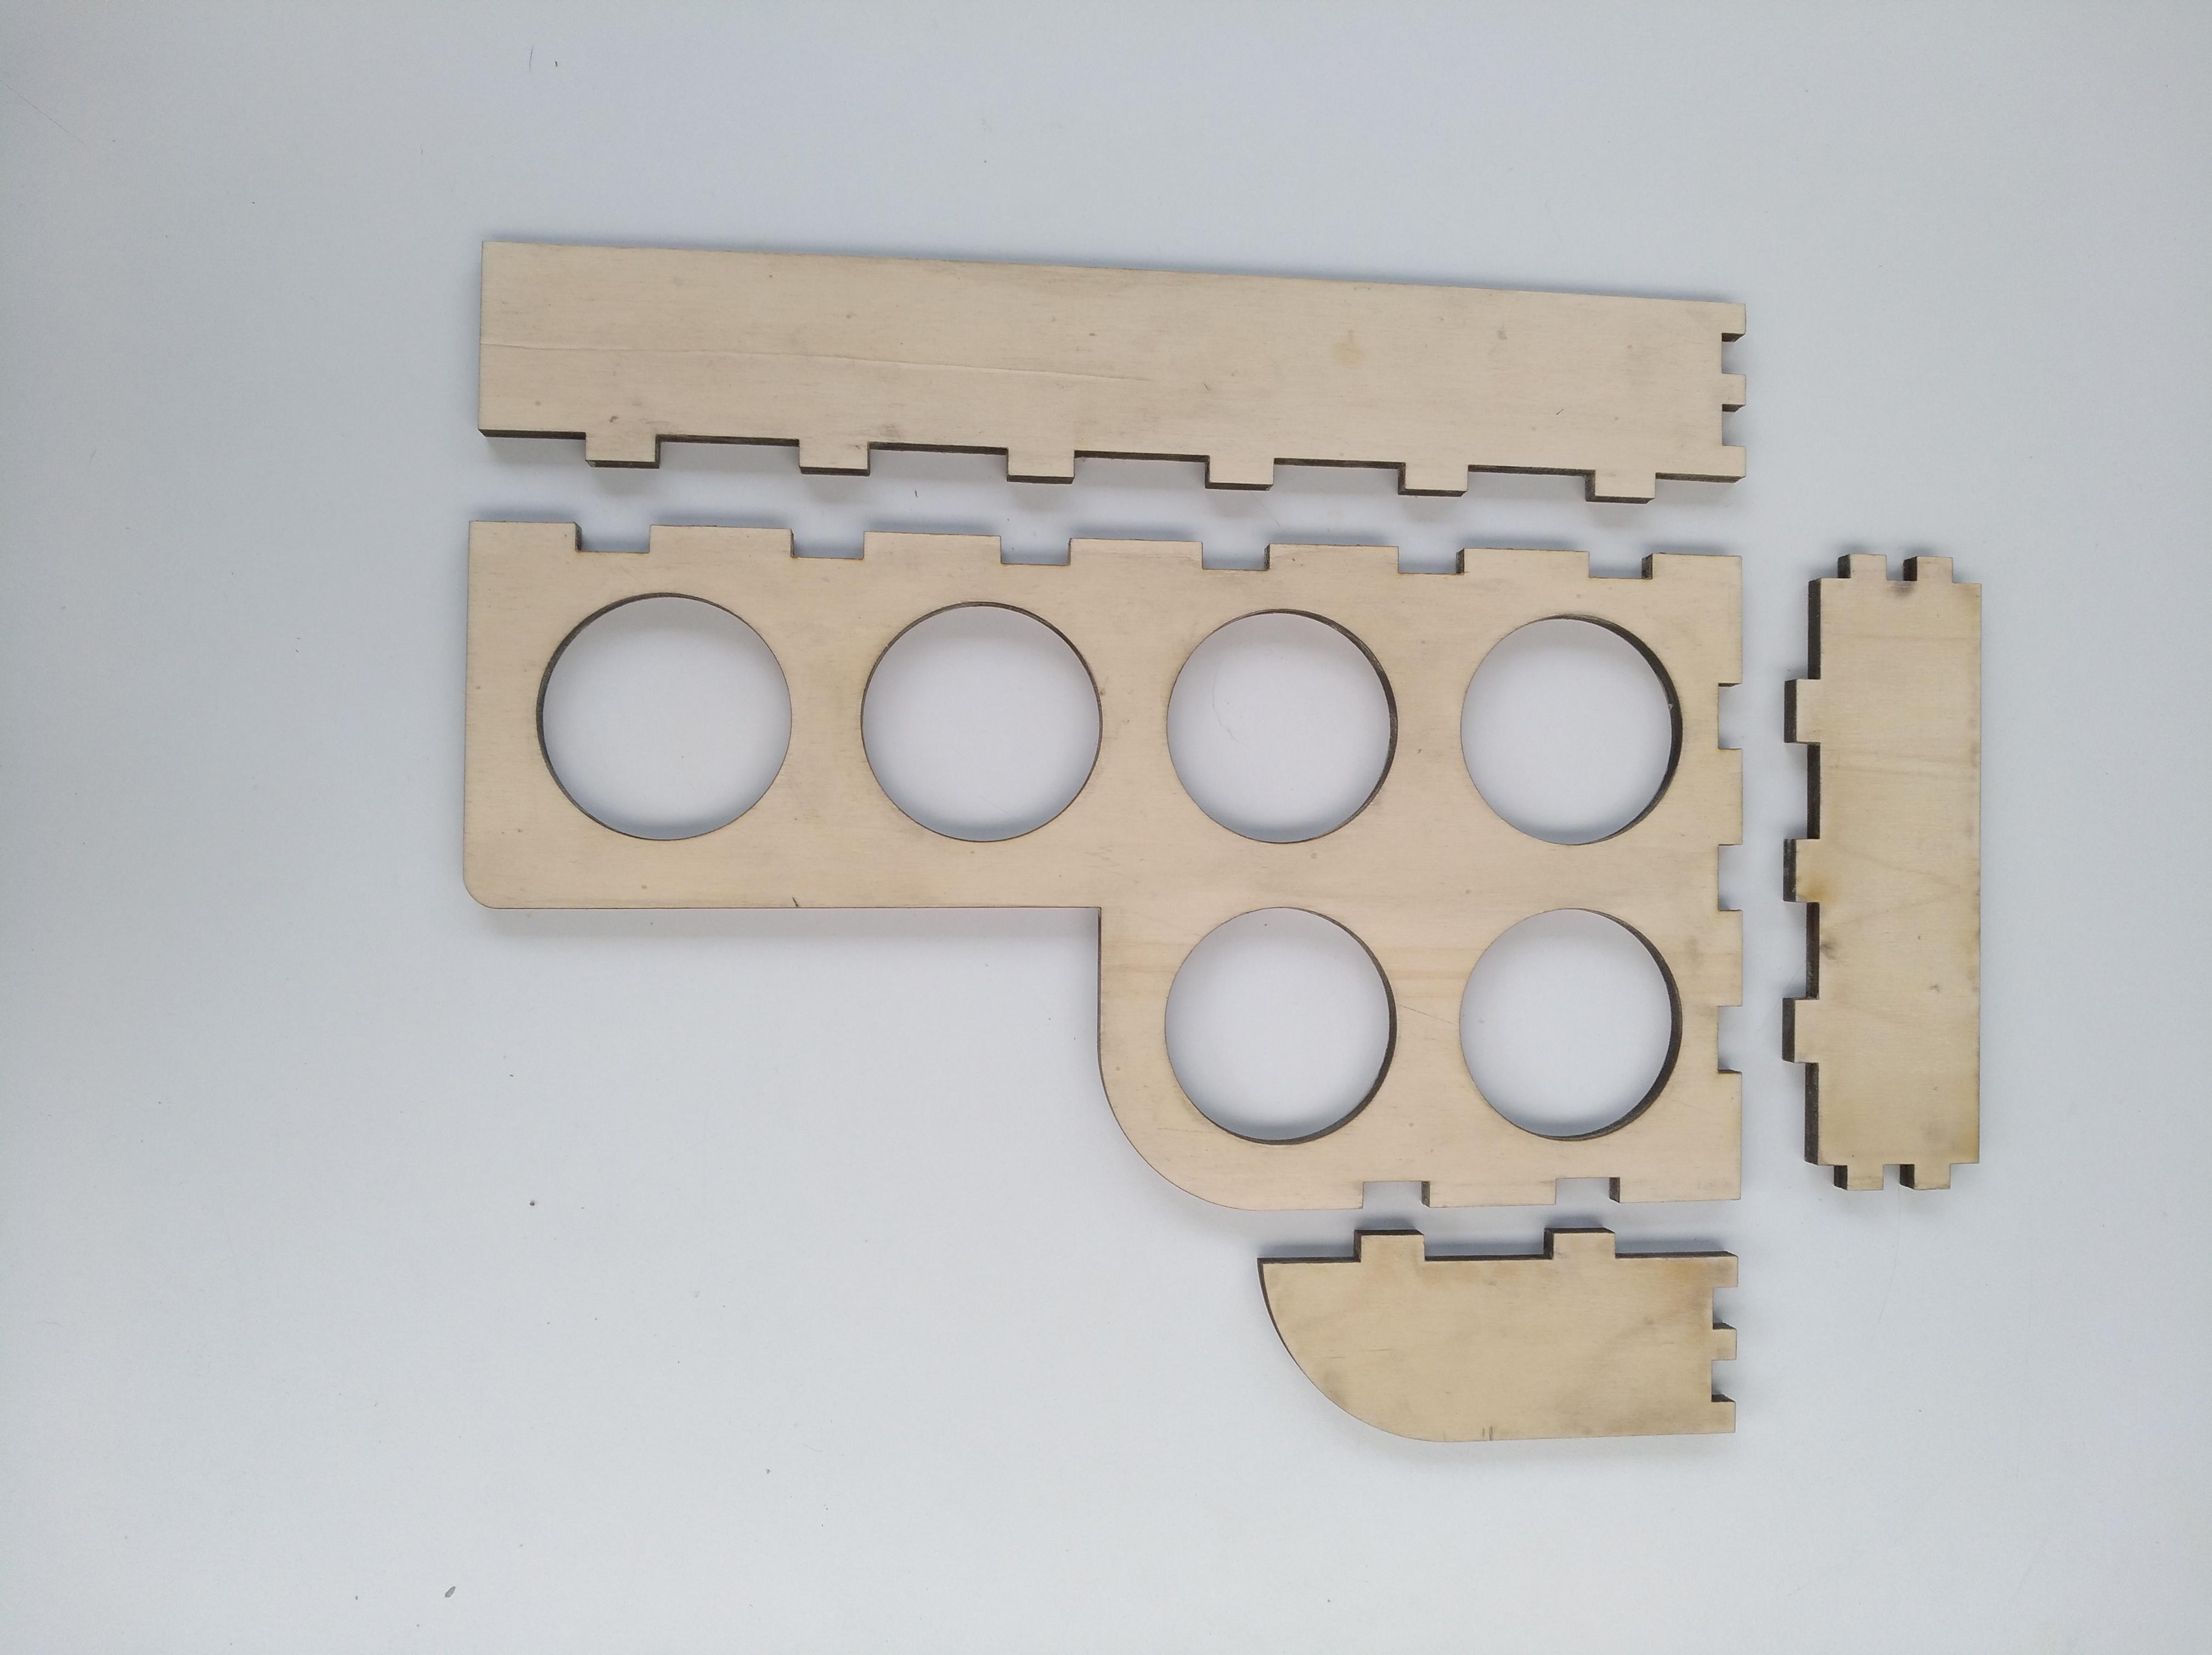 Picture of Assemble the Multiplex Parts